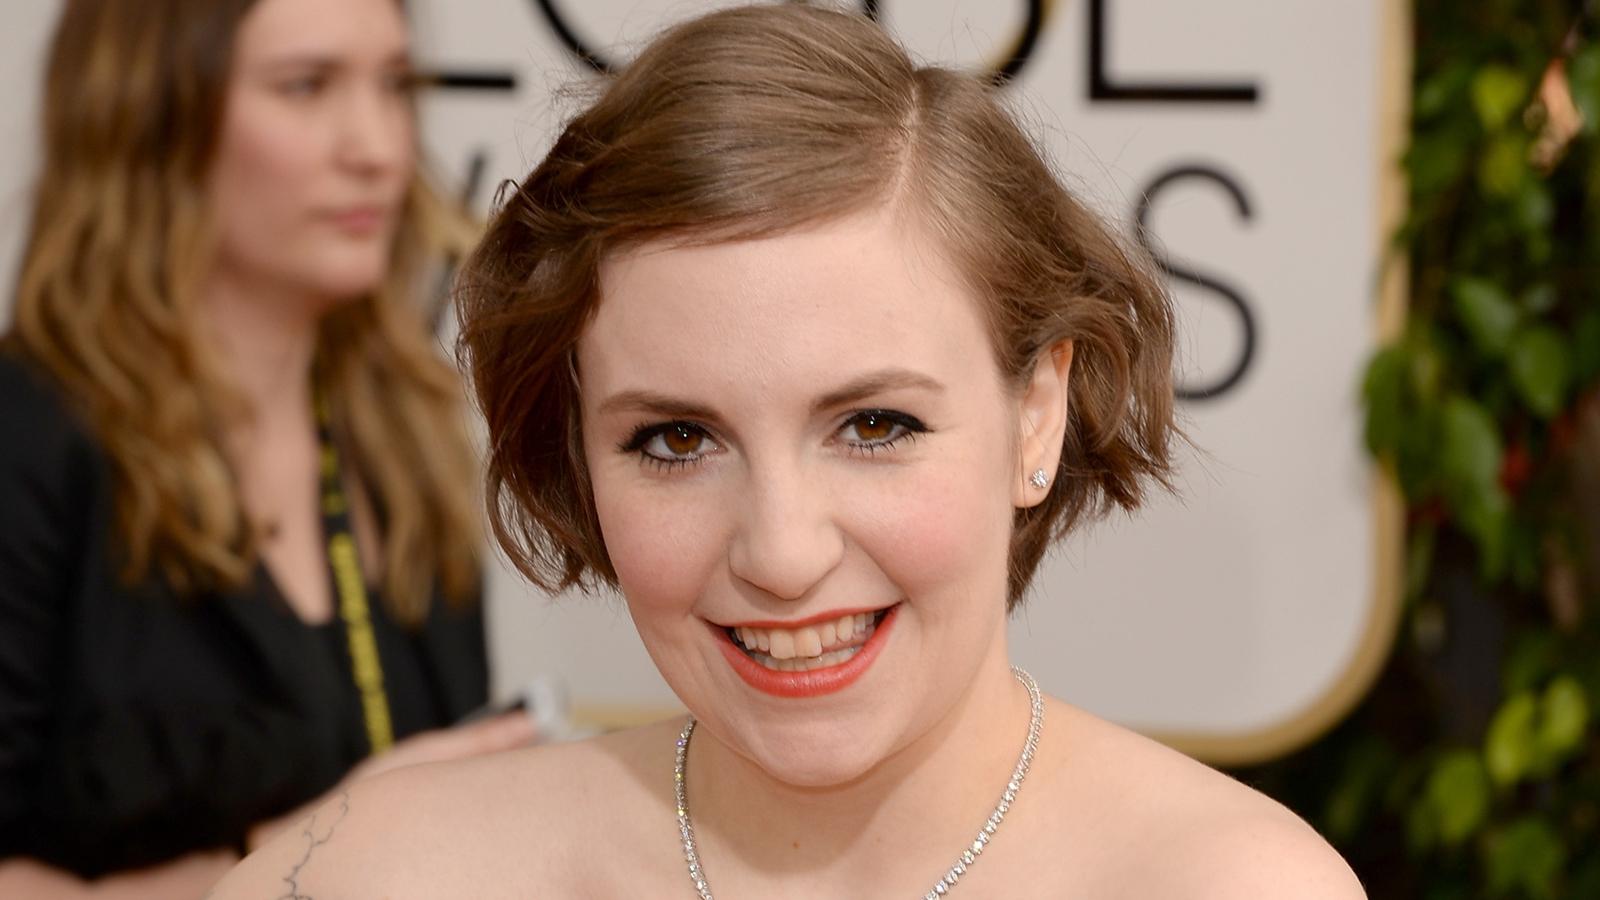 Latest Hollywood Actress Nude Photos News: Hollywood